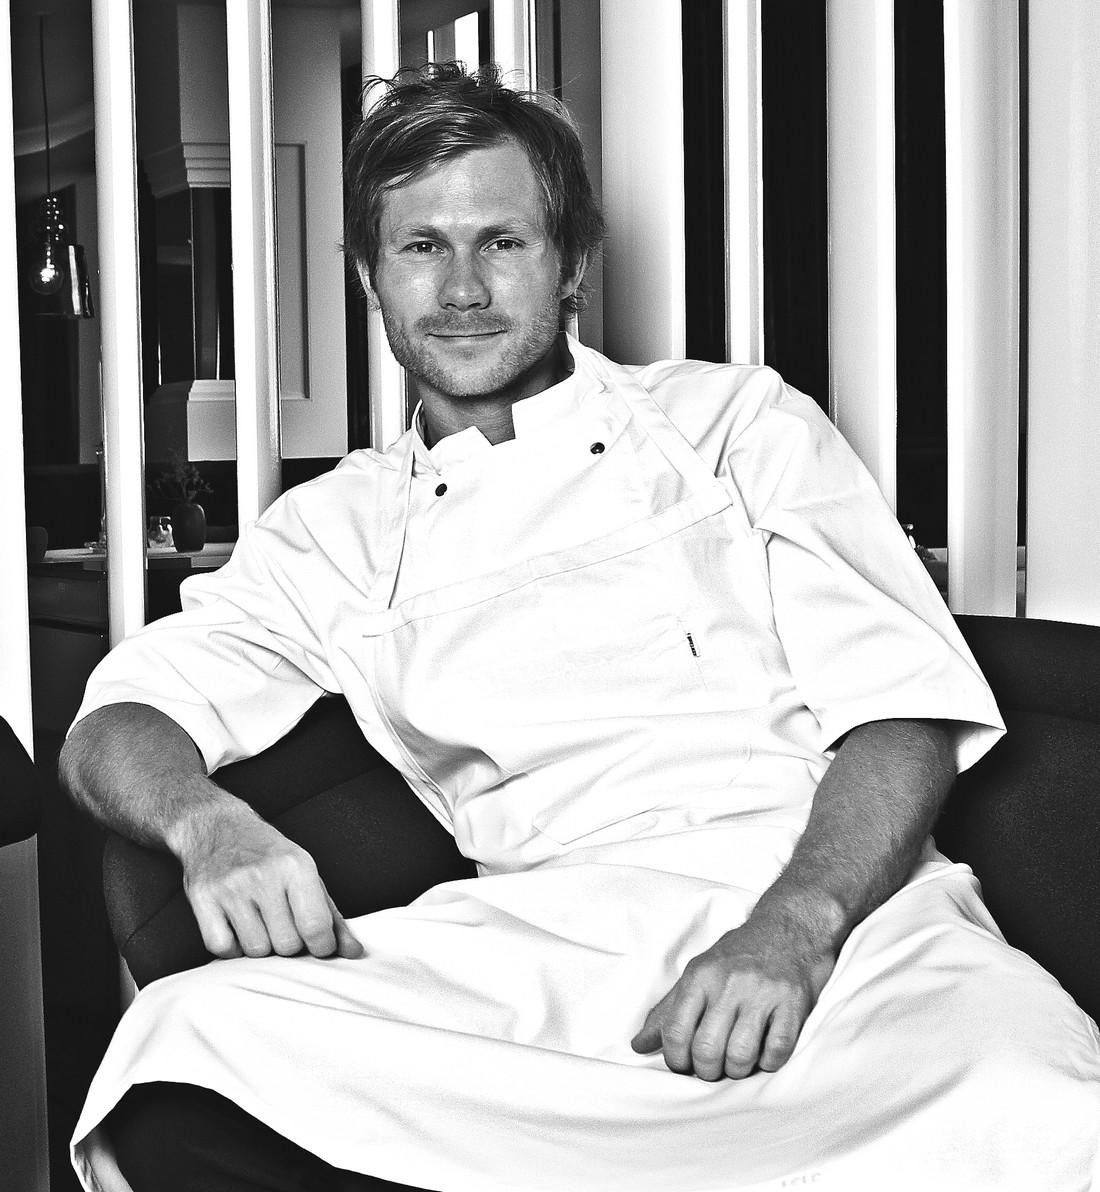 Le Chef Rasmus Kofoed ©Claes Bech Poulsen